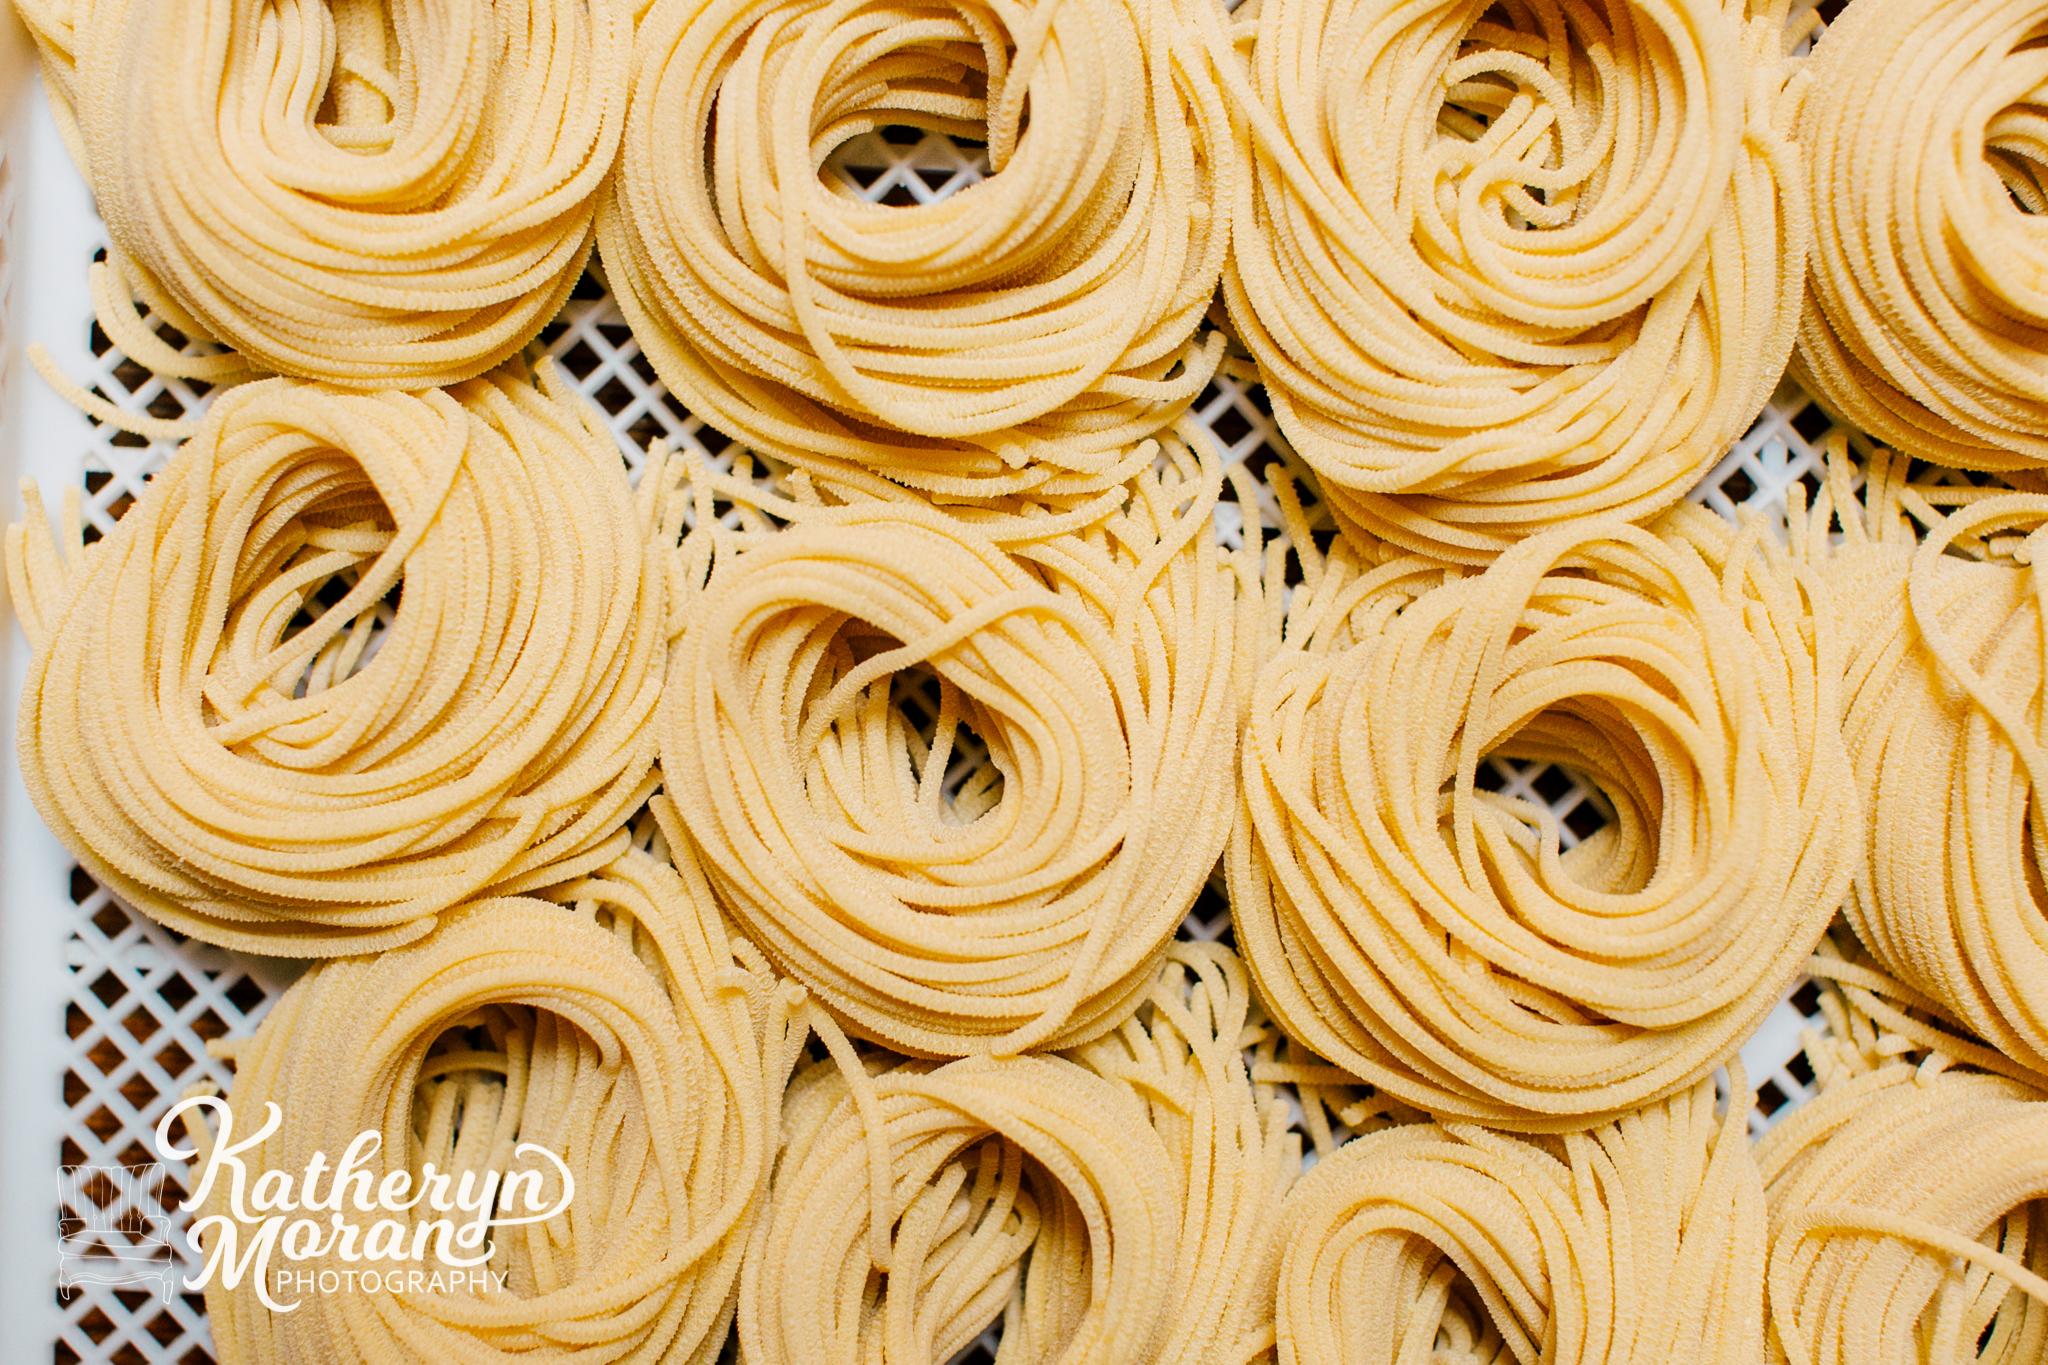 seattle-food-photographer-katheryn-moran-due-cucina-italiana-10.jpg